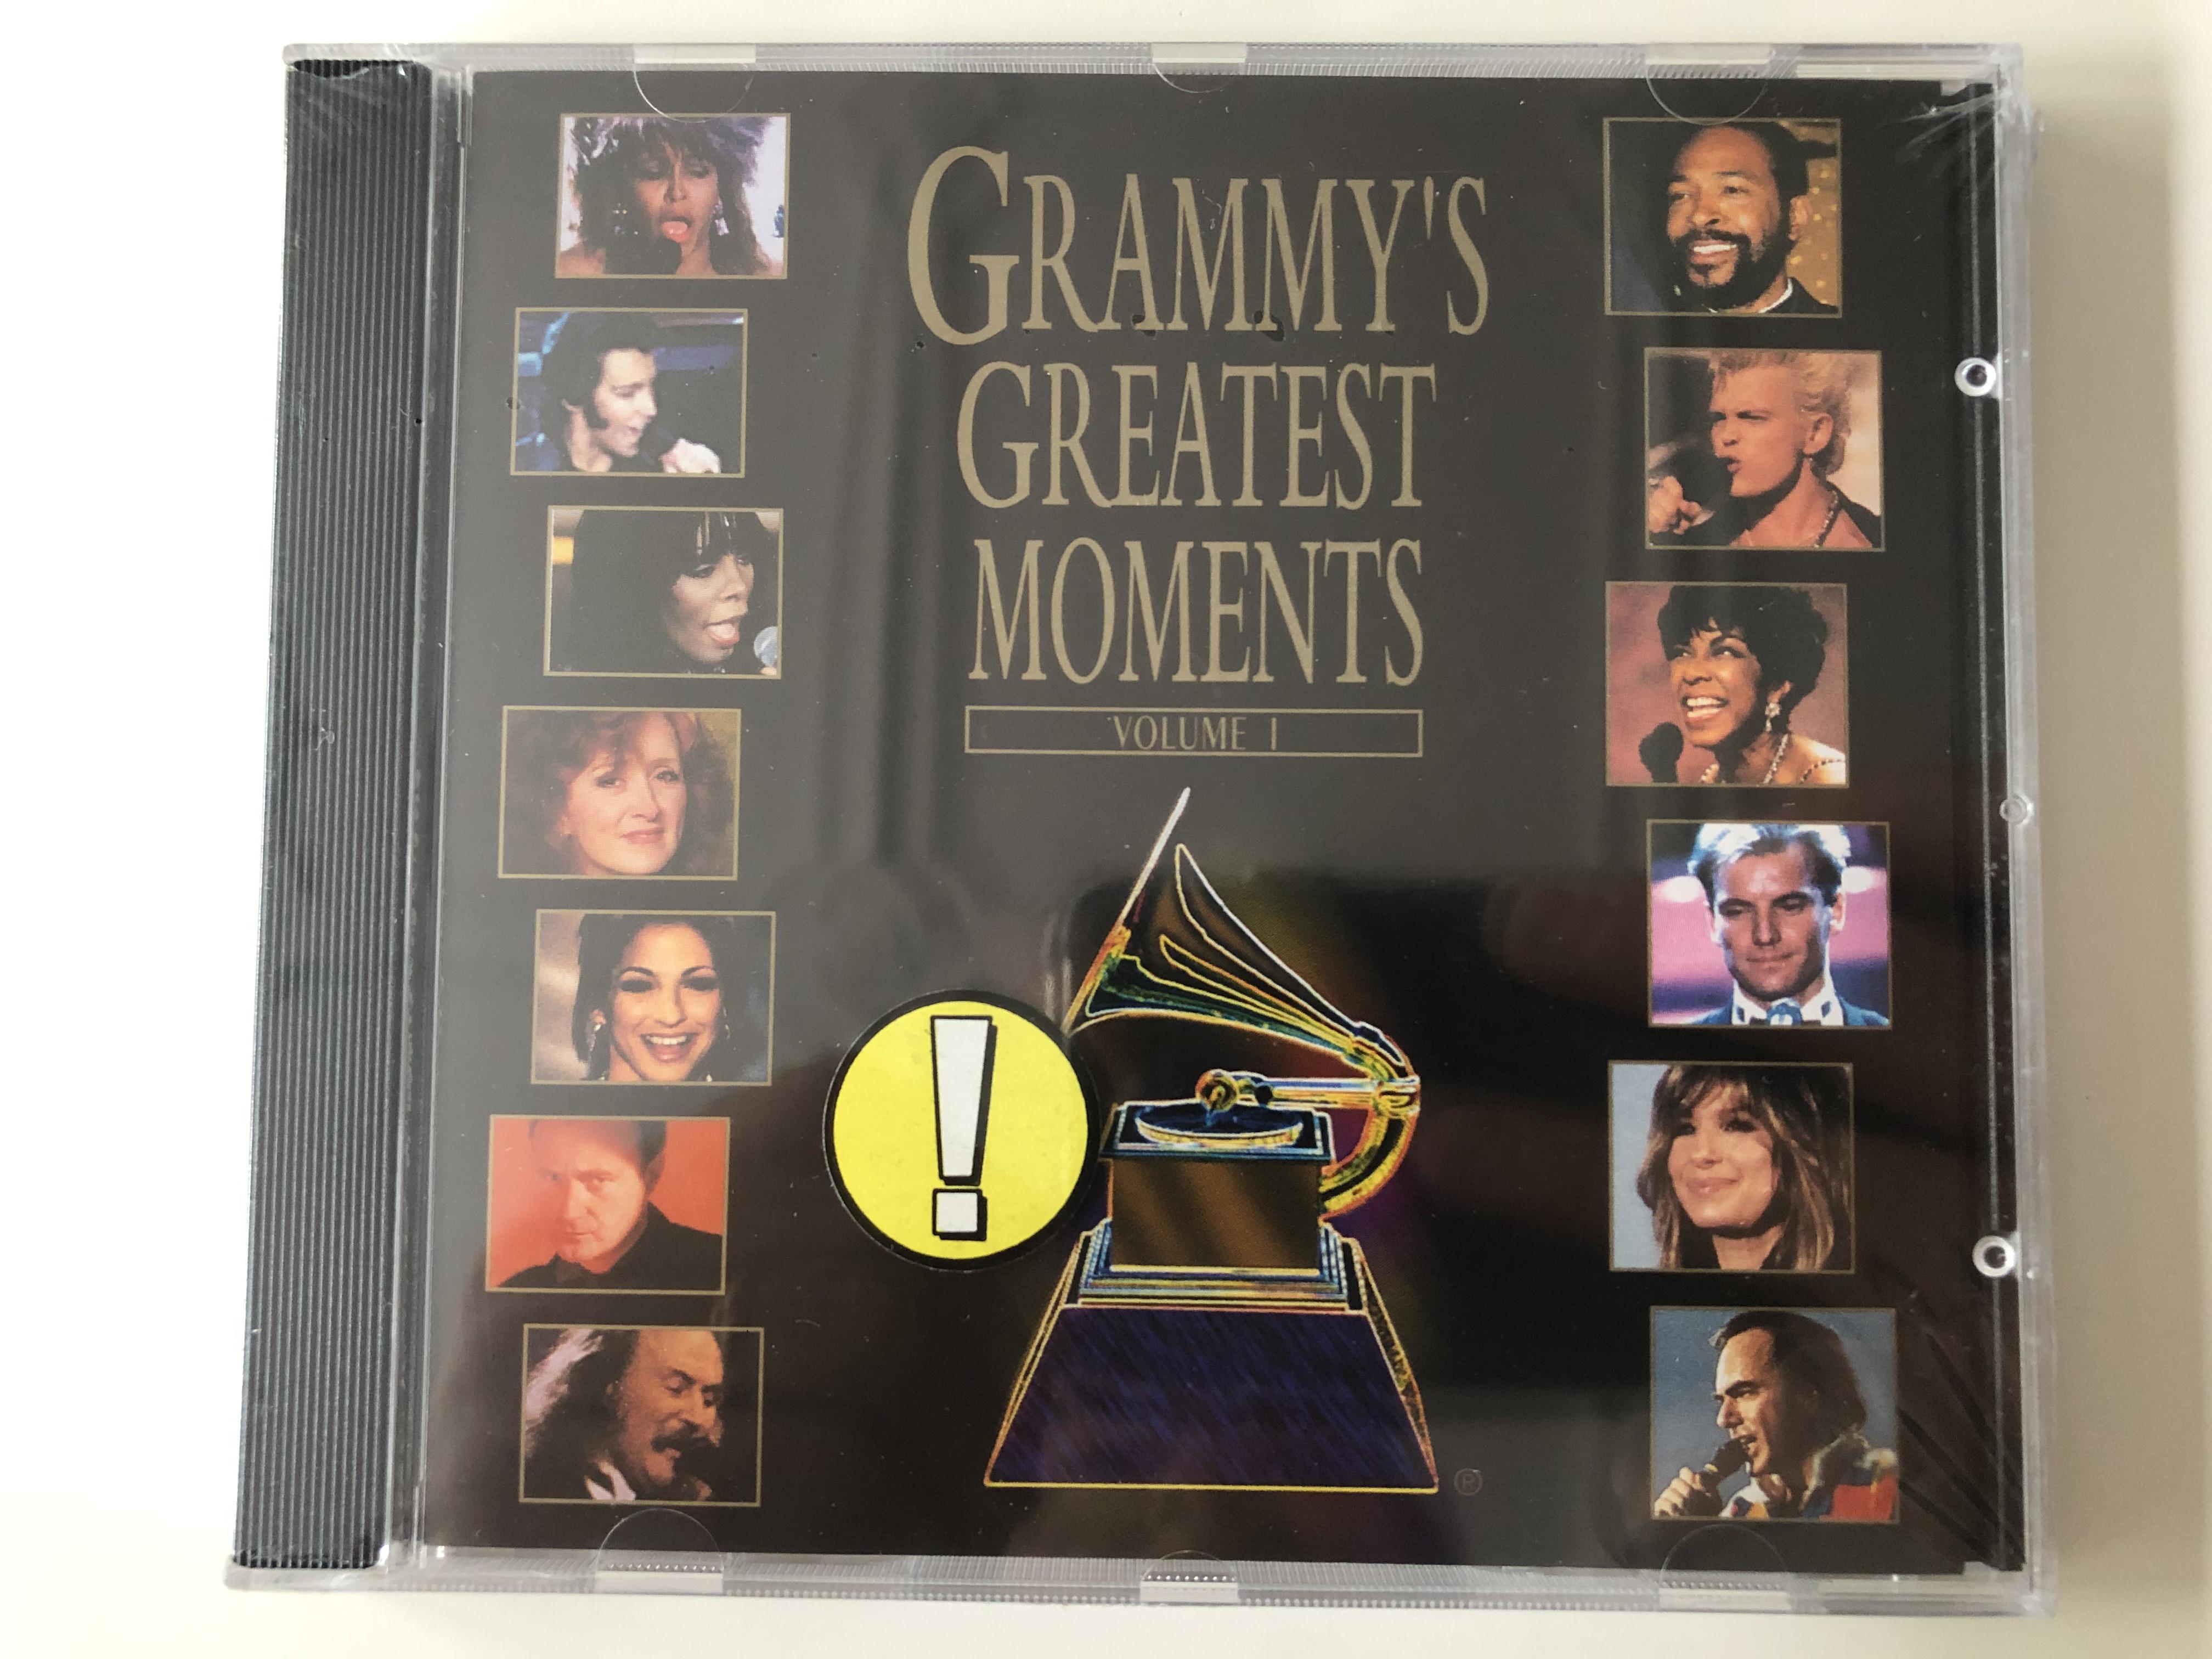 grammy-s-greatest-moments-volume-i-atlantic-audio-cd-1994-7567-82574-2-1-.jpg